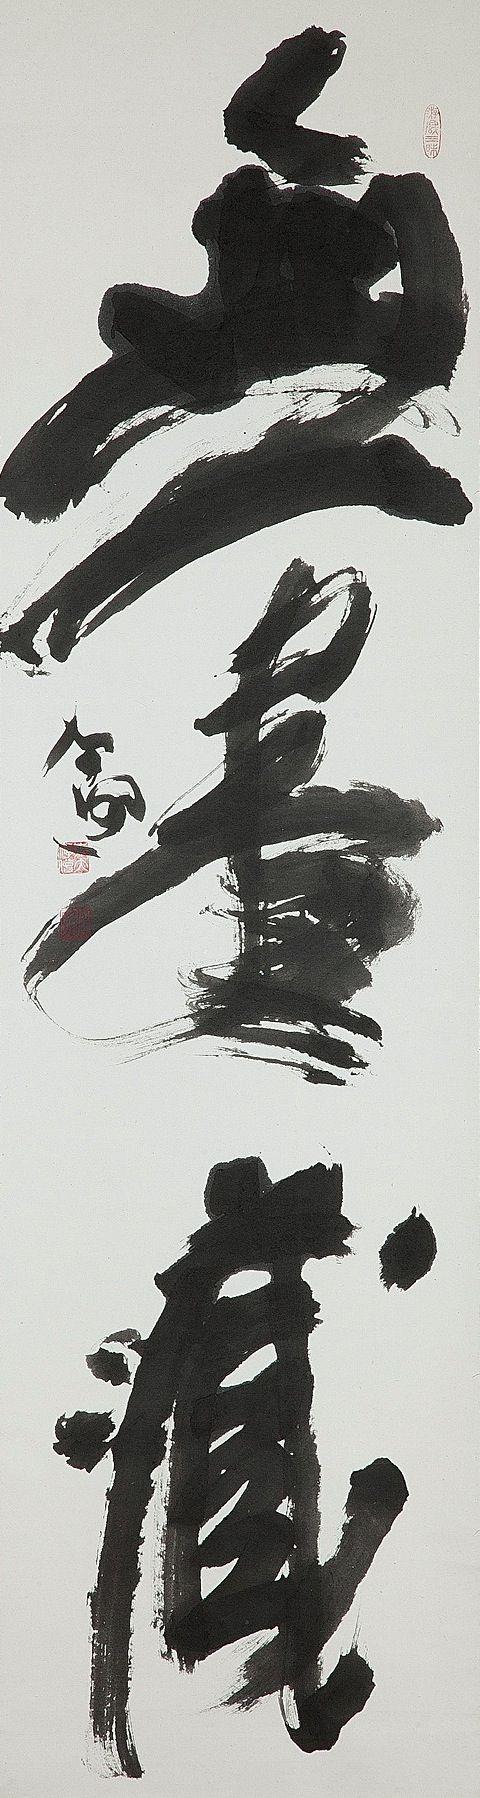 "Shimizu Kosho 清水公照 (1911-1999), ""Inexhaustible"" 無尽蔵."